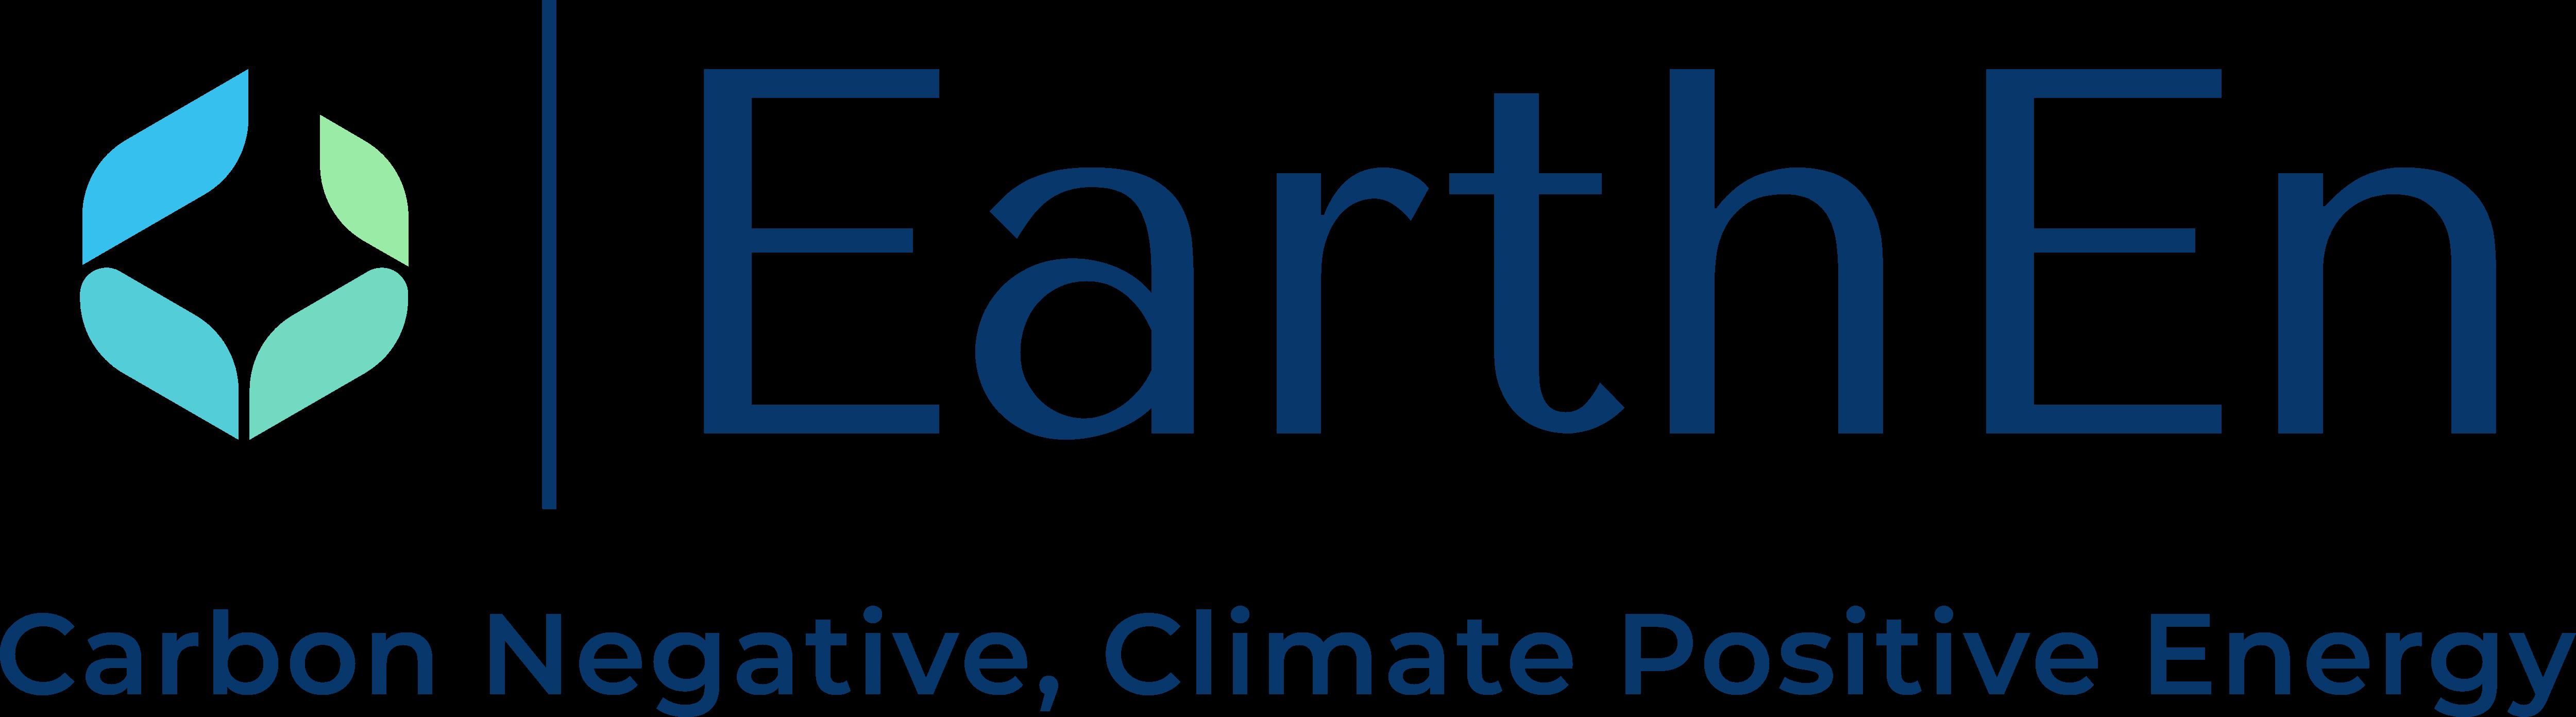 EarthEn, Inc. Logo